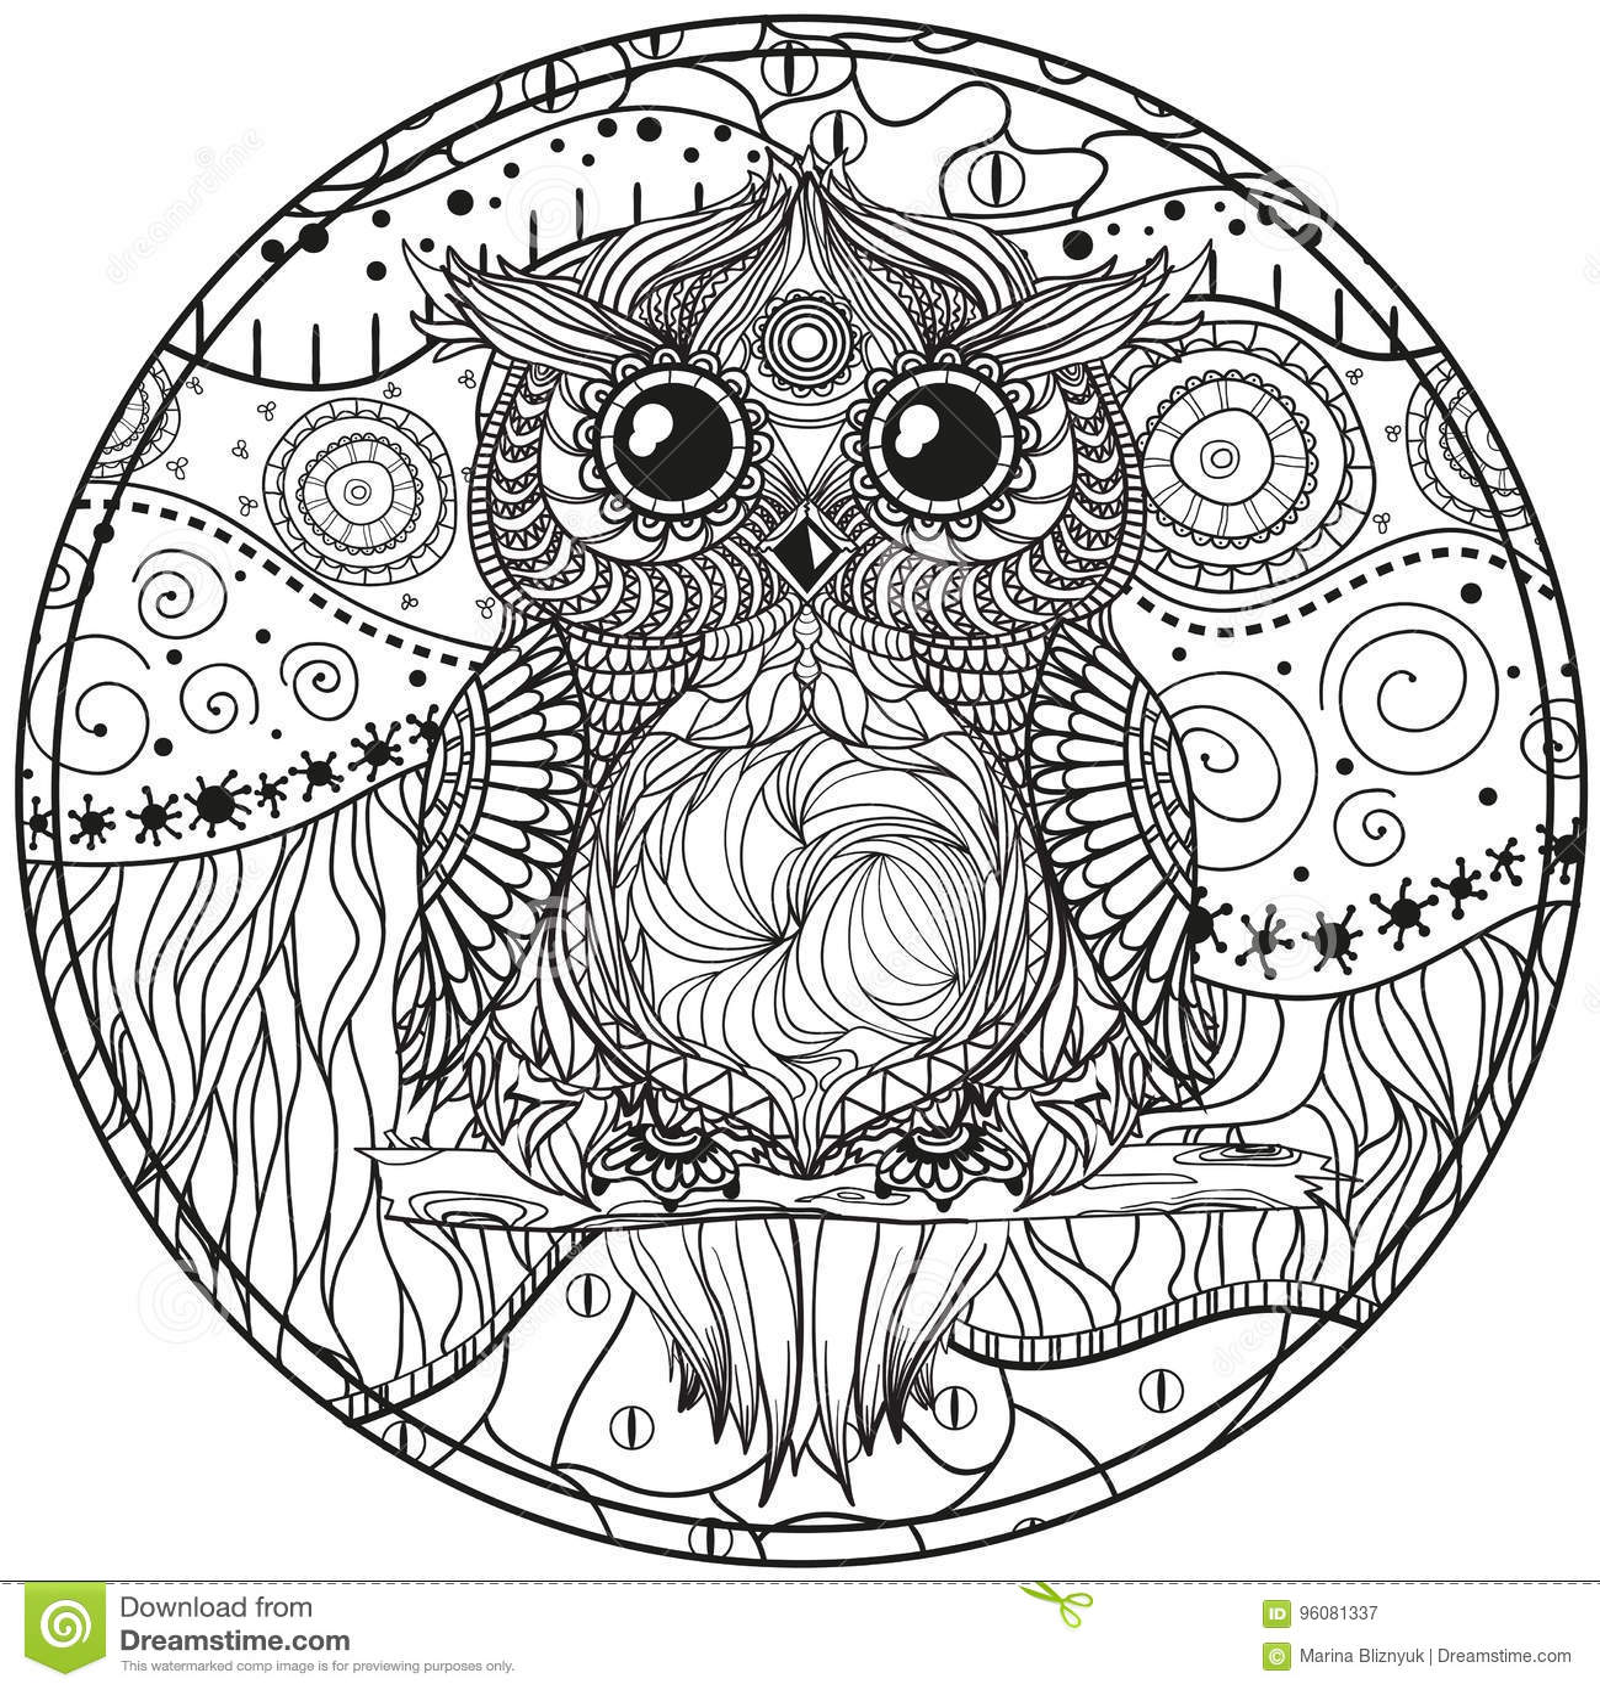 mandala mit eule vektor abbildung illustration von